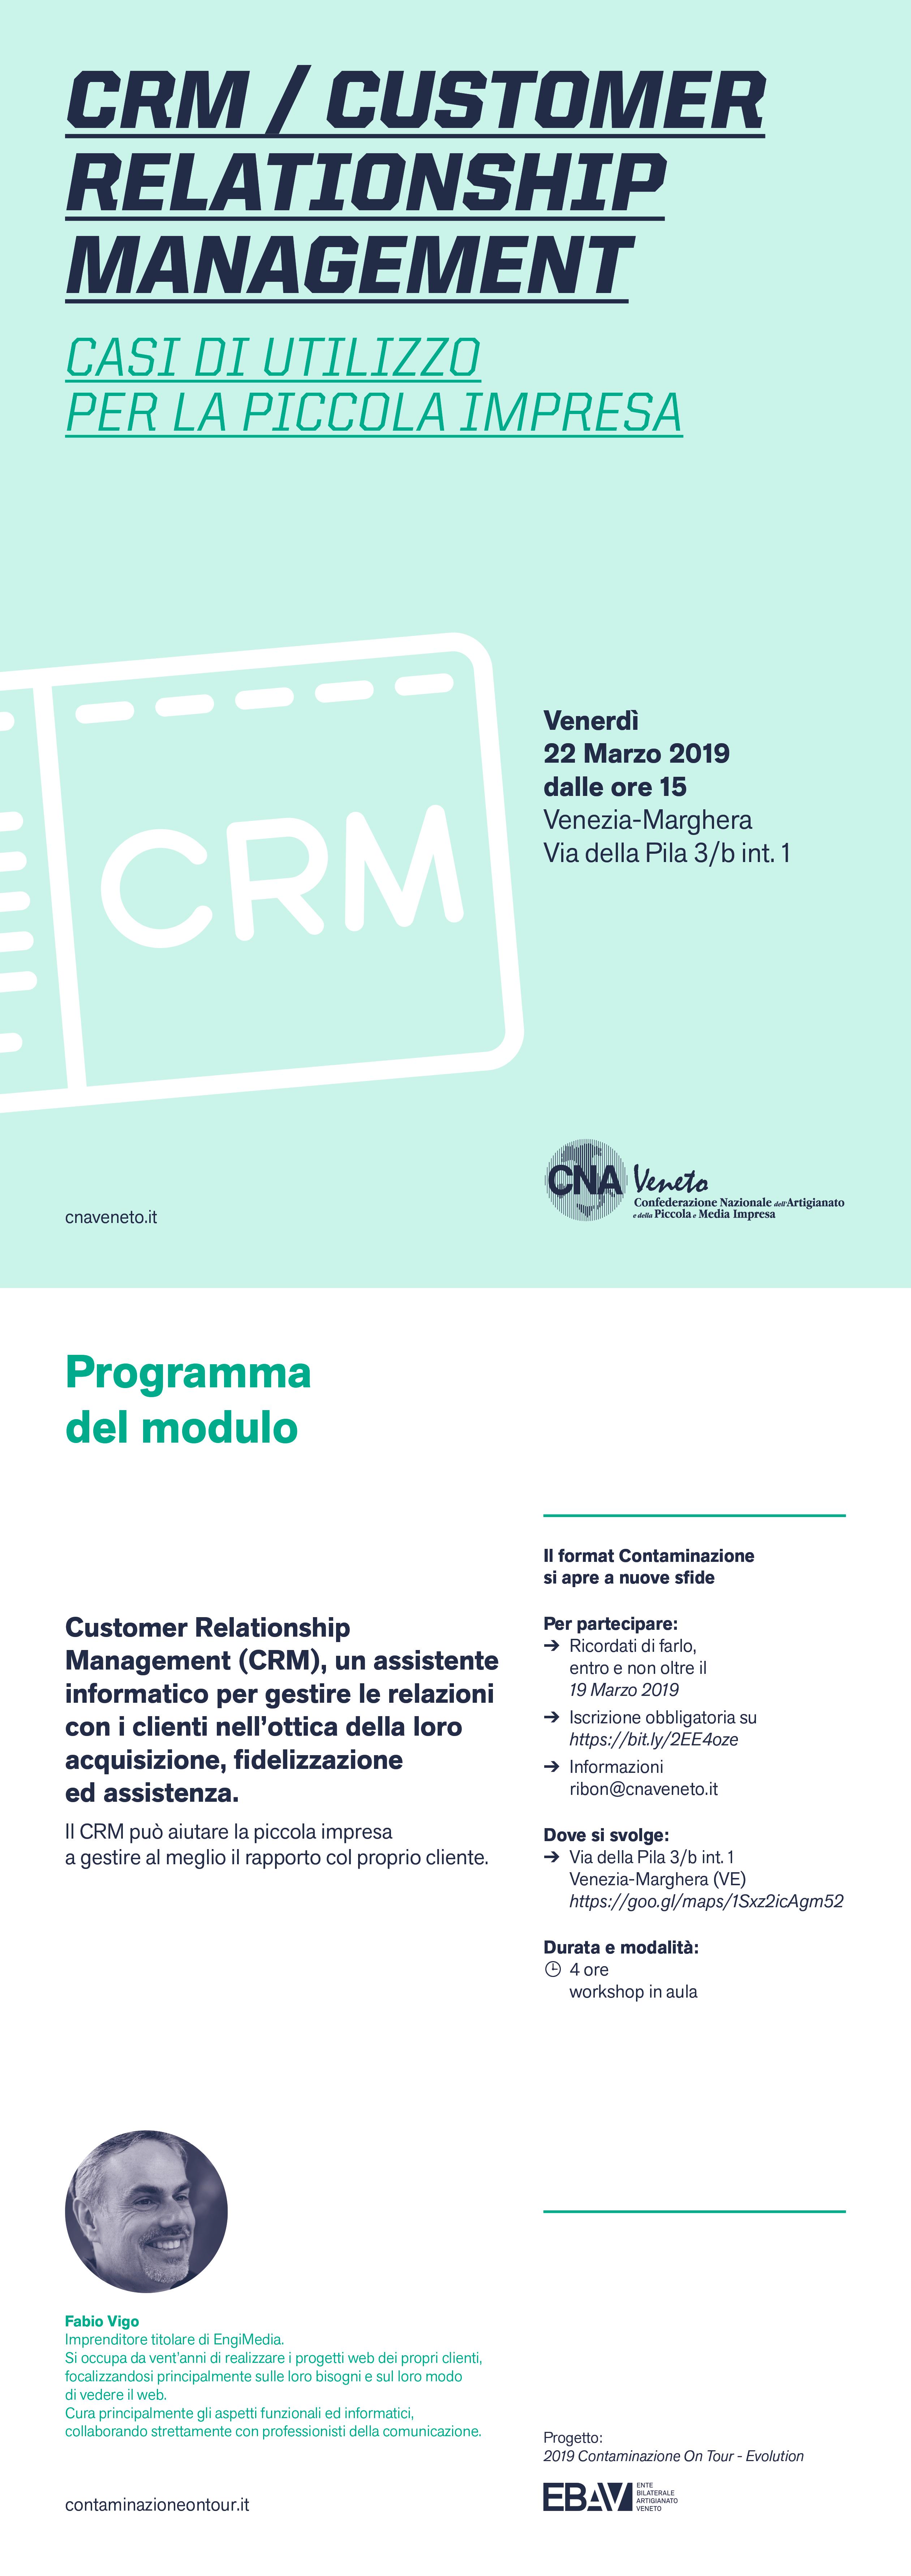 CRM / Customer Relationship Management - Casi di utilizzo per la piccola impresa